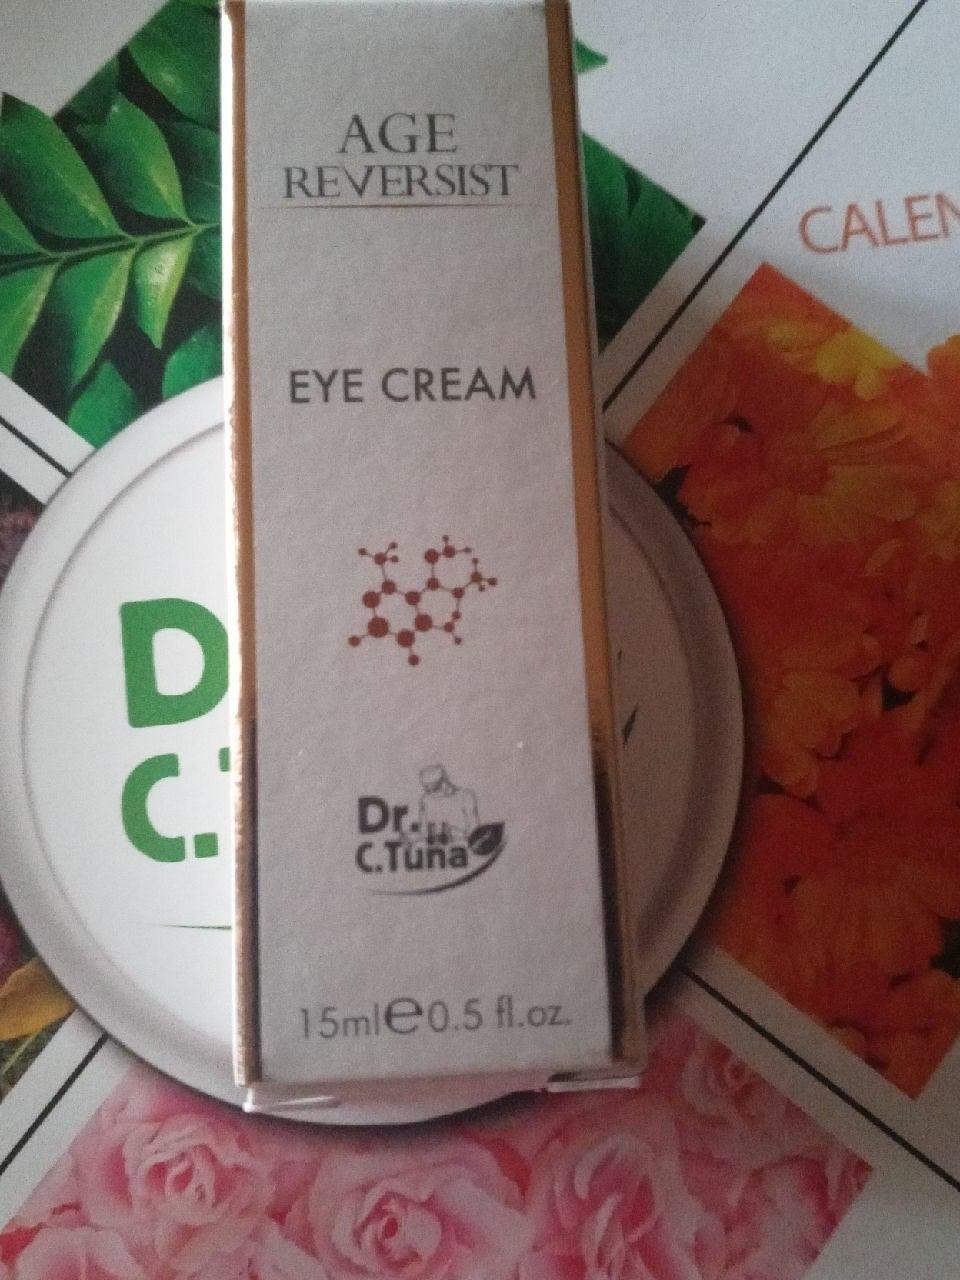 Age Reversist Eye cream